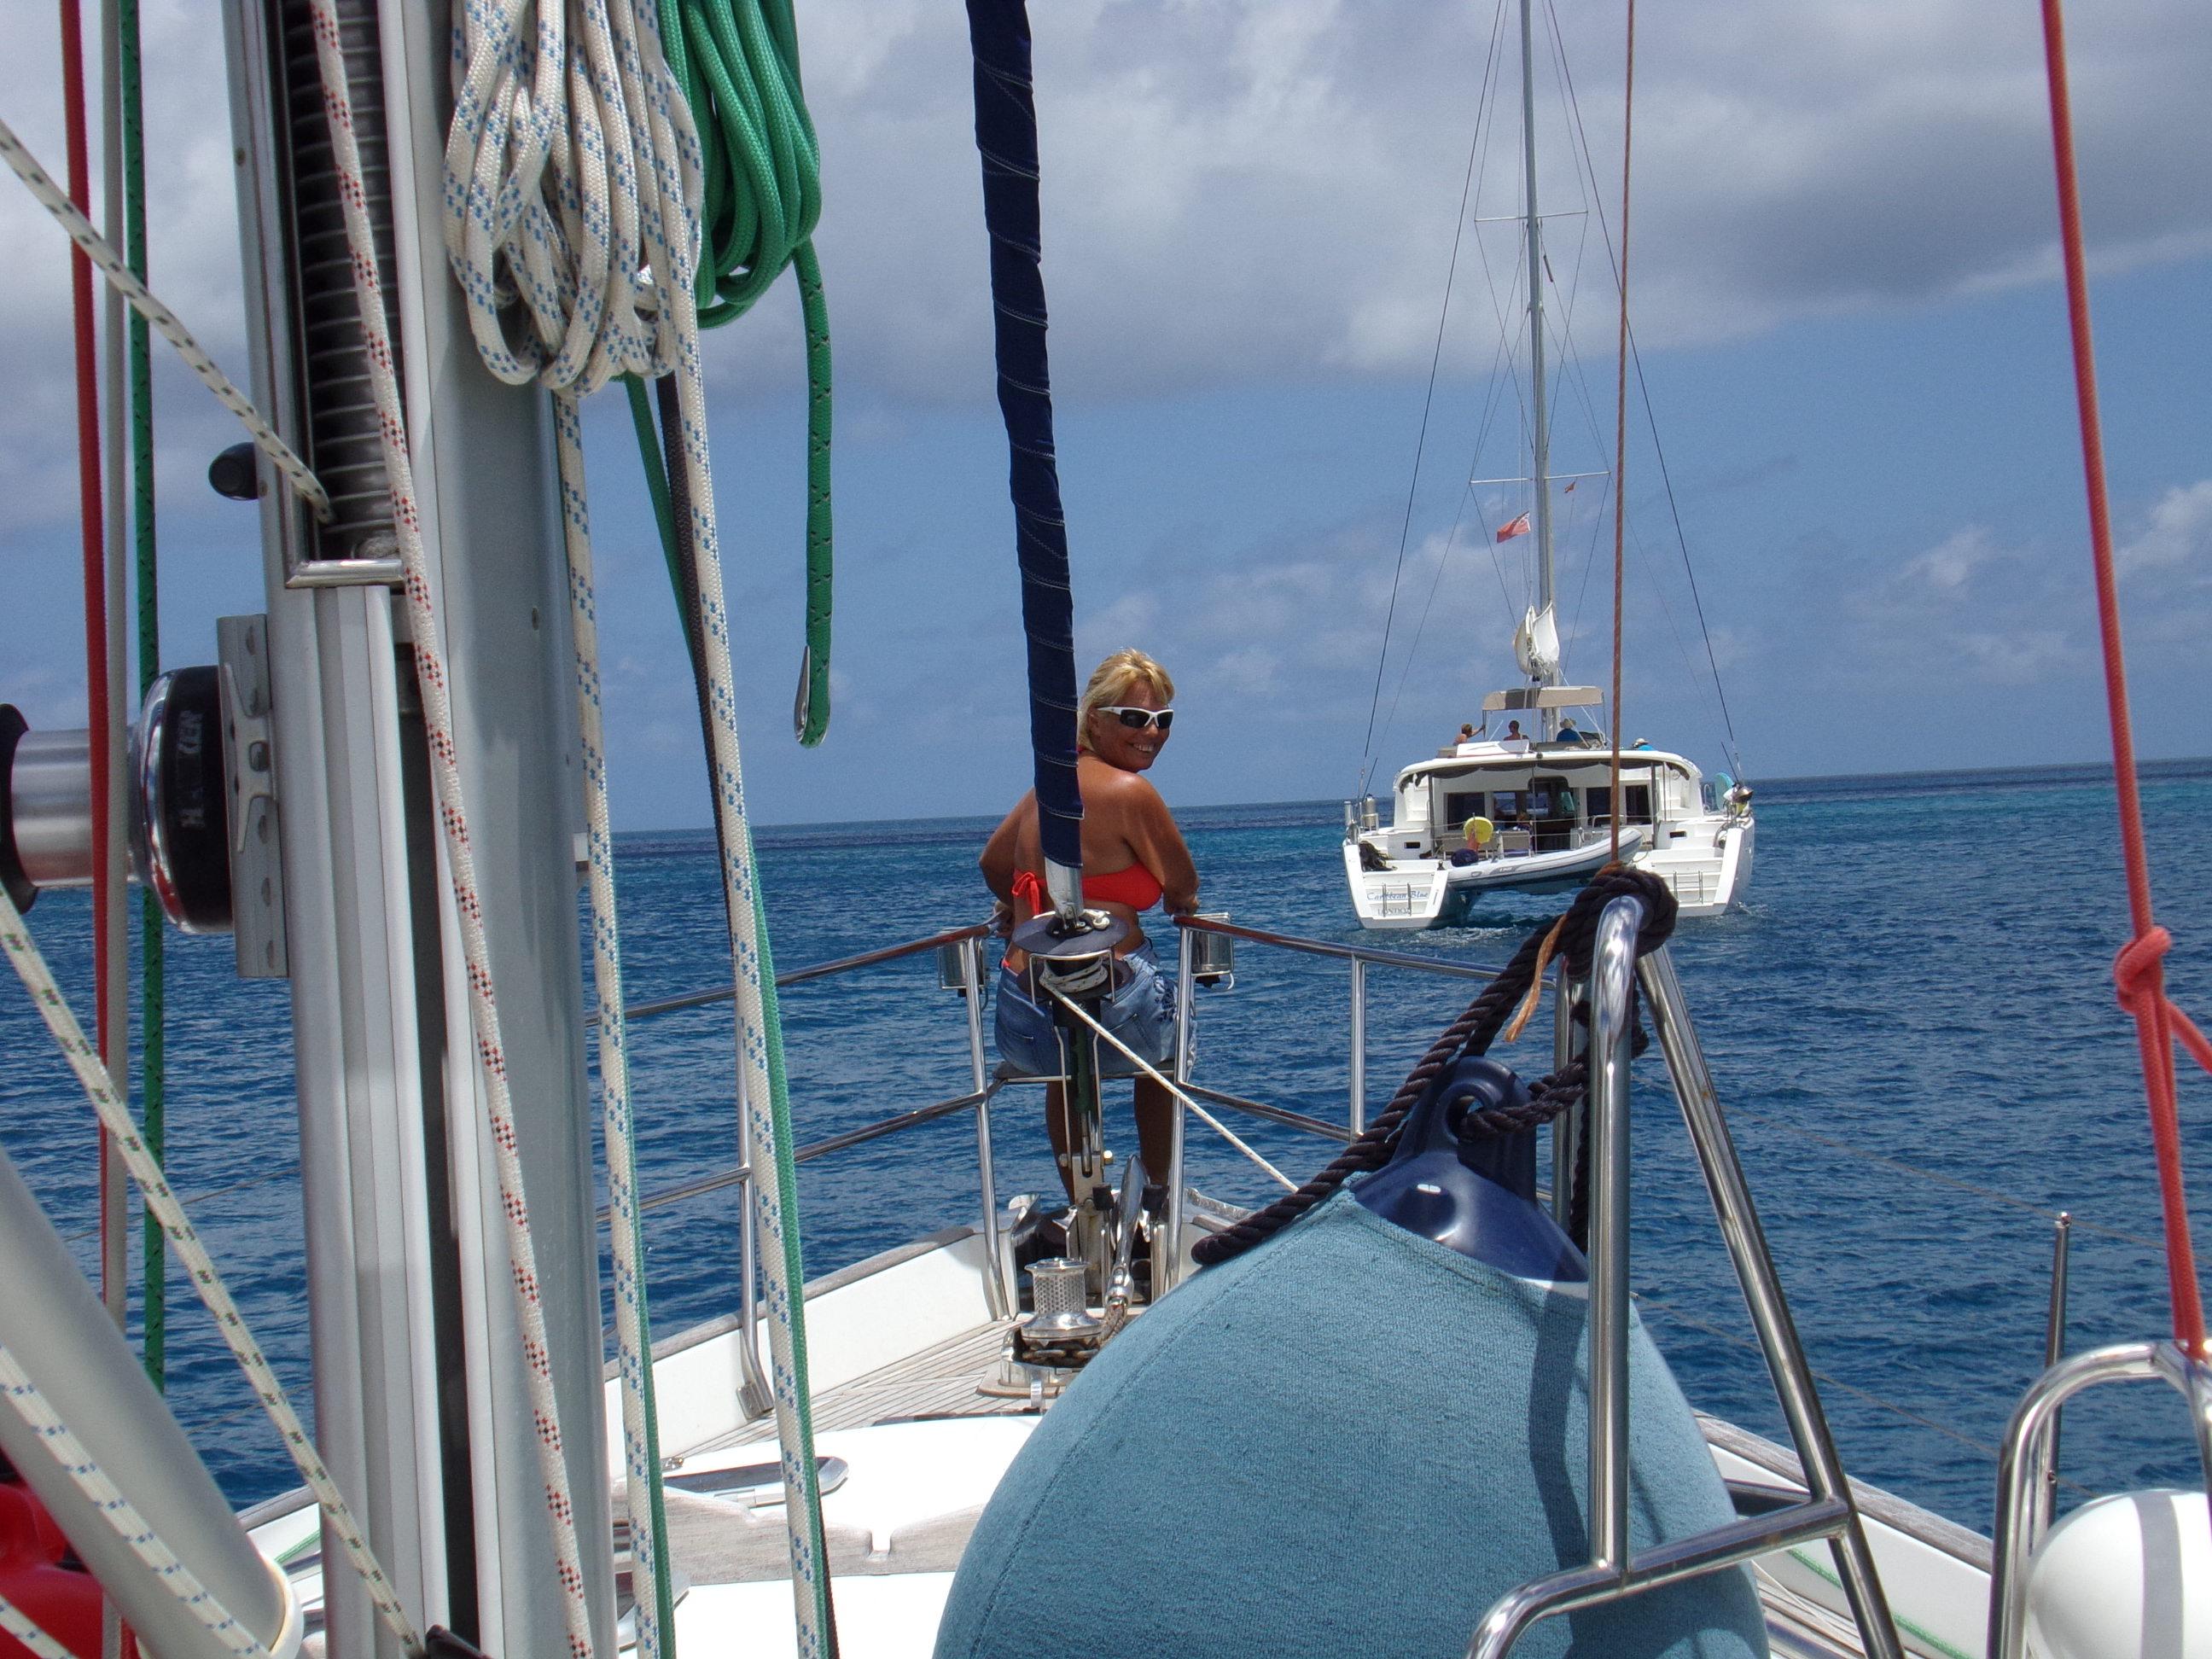 Fiona on the bow